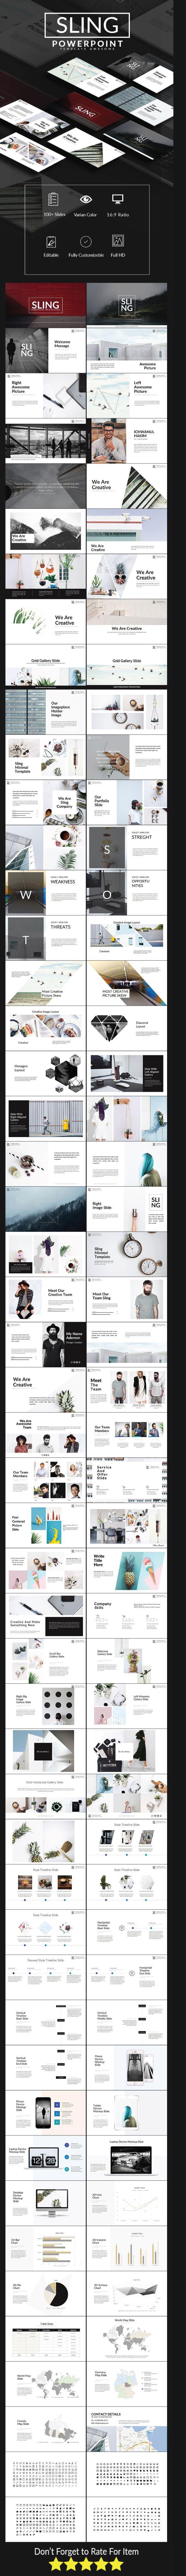 237 best presentations images on pinterest | business presentation, Presentation templates